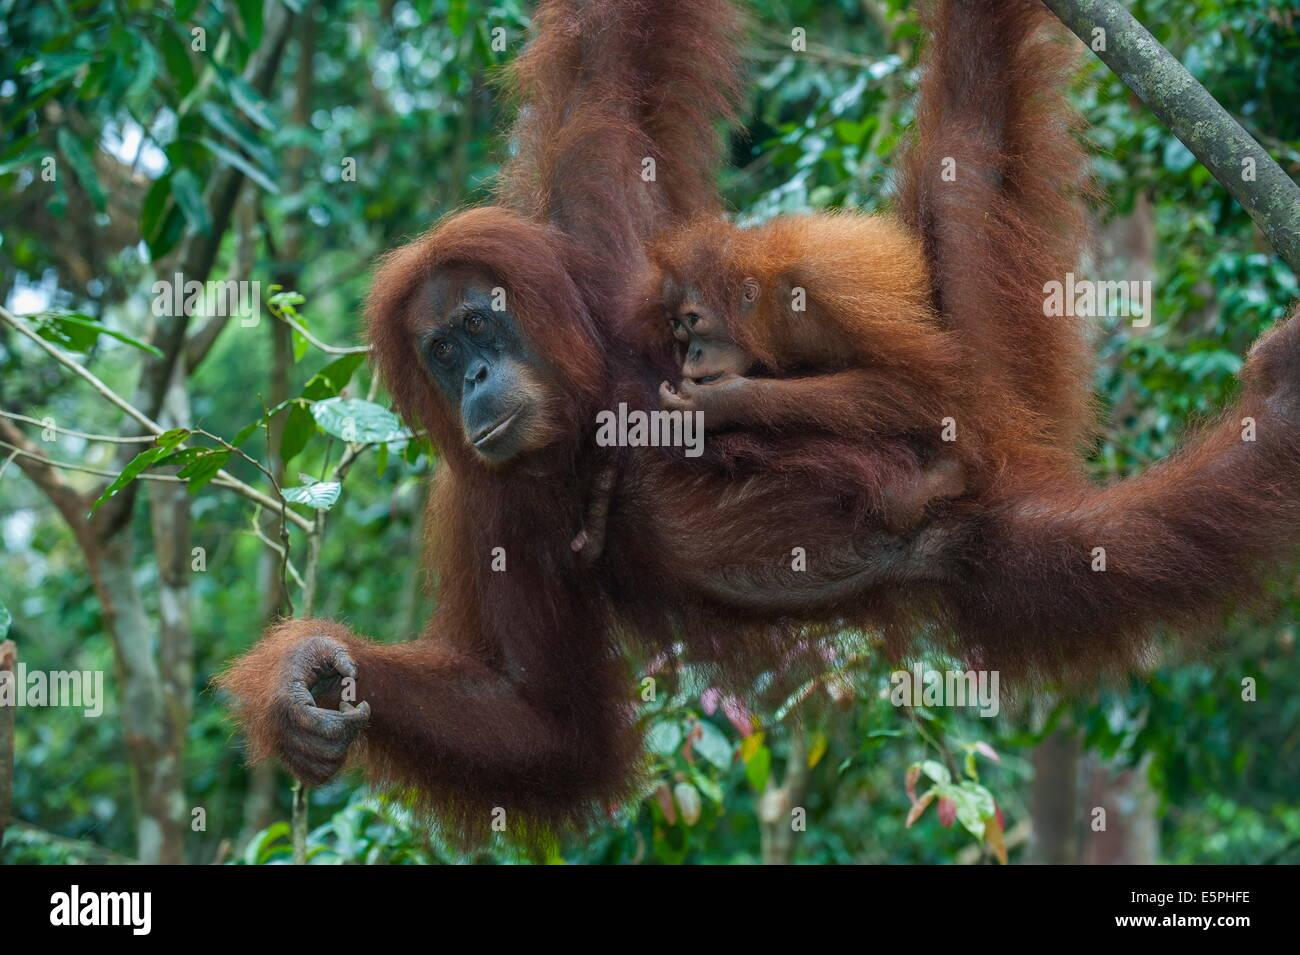 Mother and baby Sumatran orangutan (Pongo abelii), Bukit Lawang Orang Utan Rehabilitation station, Sumatra, Indonesia Stock Photo